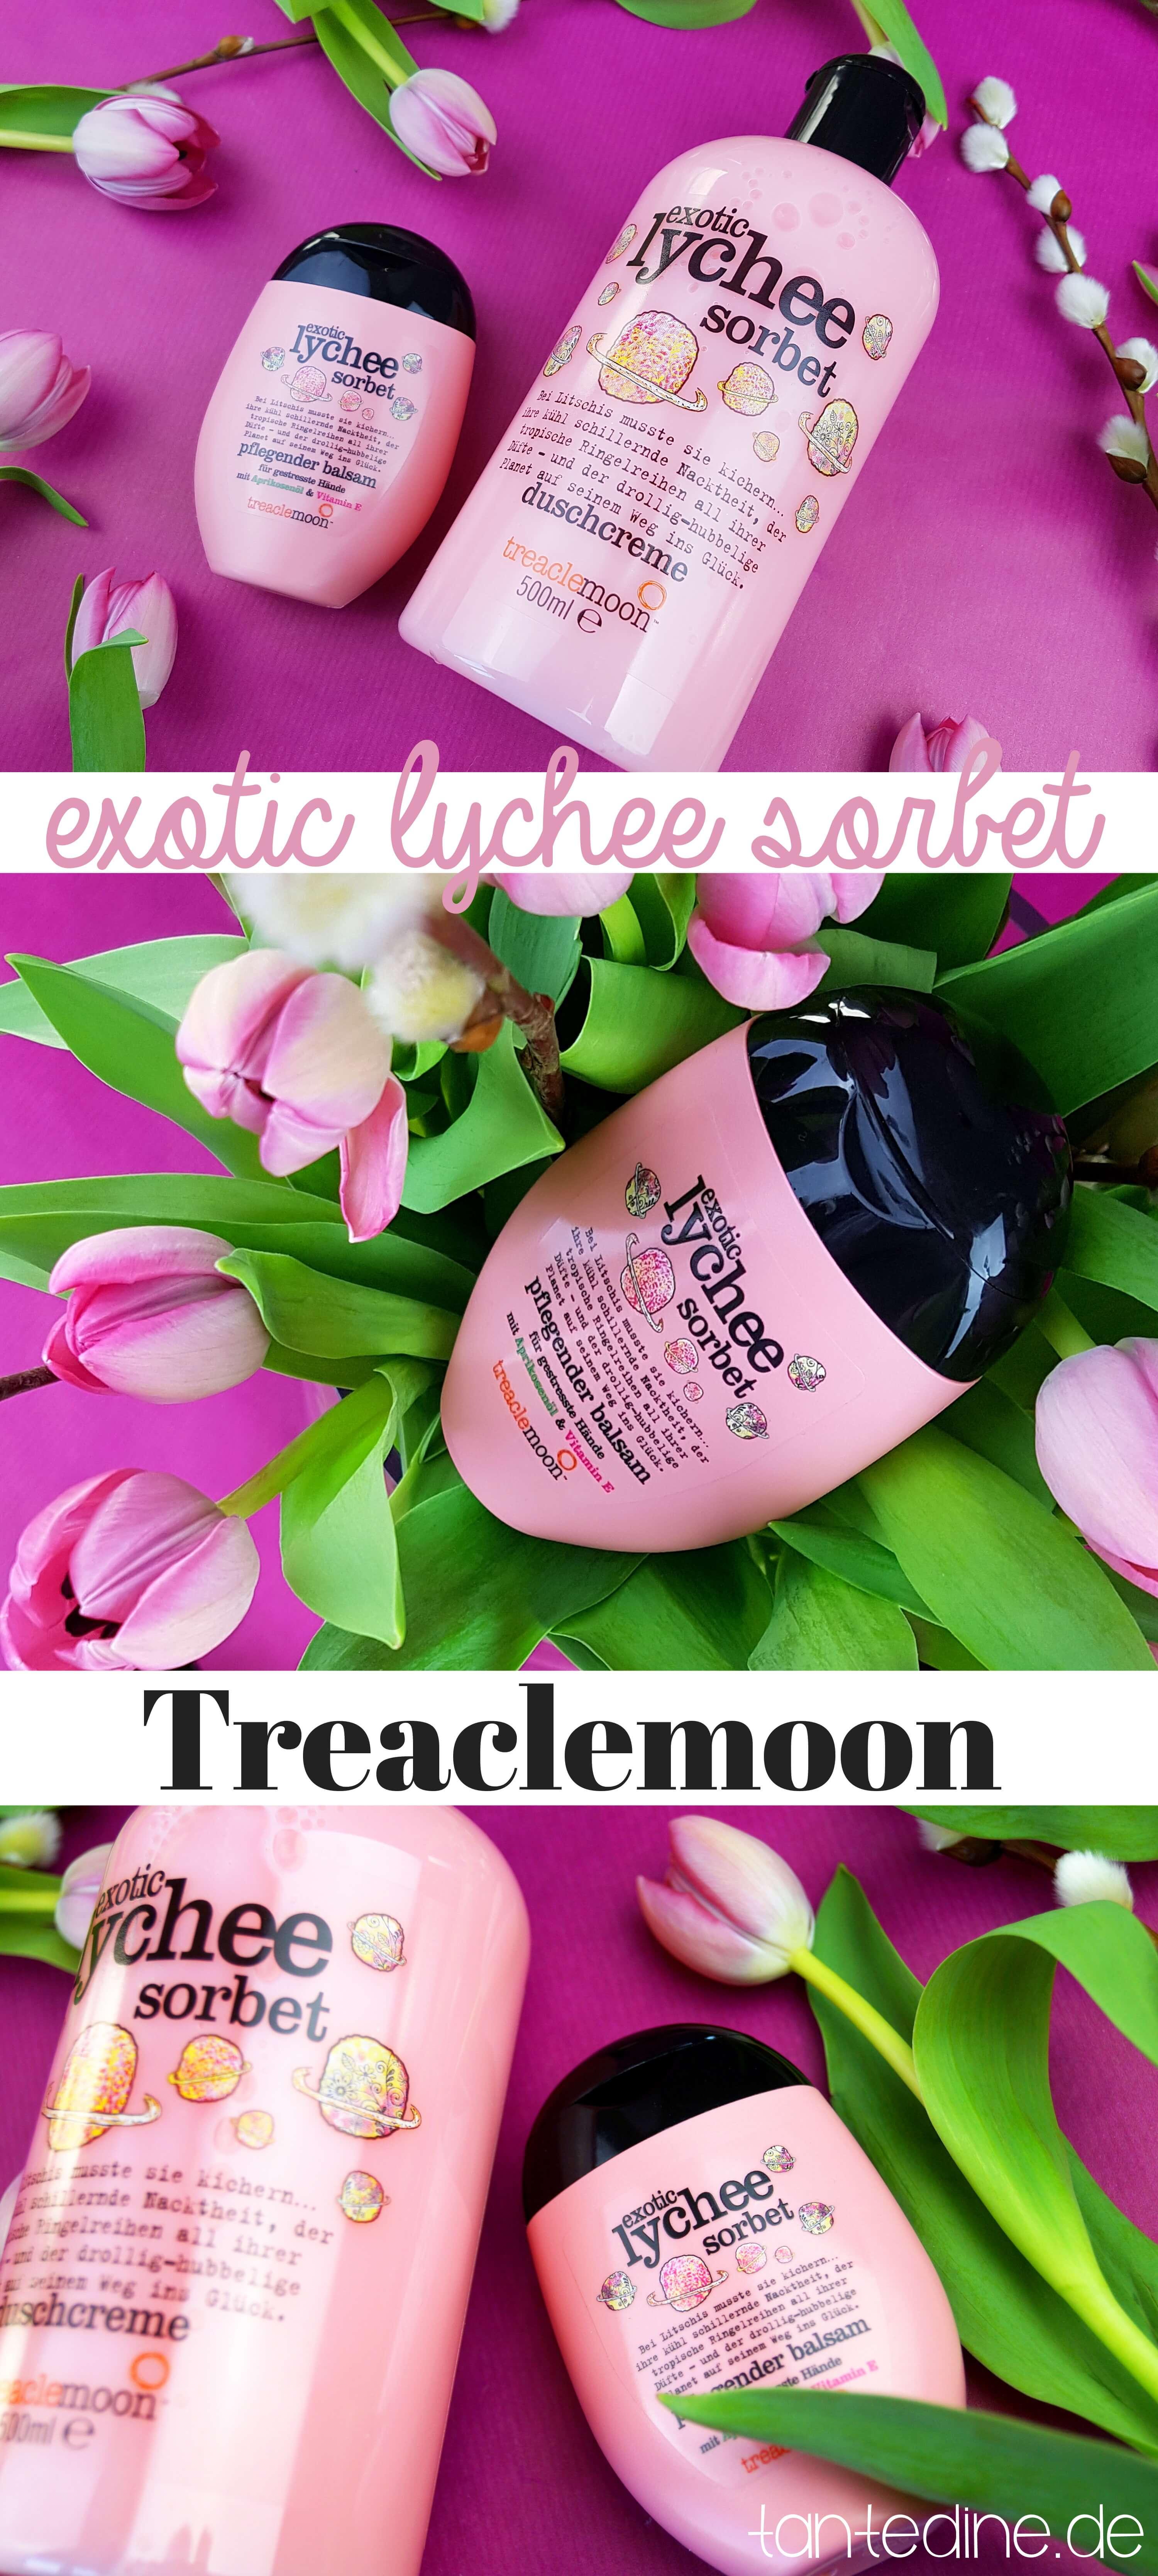 Exotic Lychee Sorbet von Treaclemoon